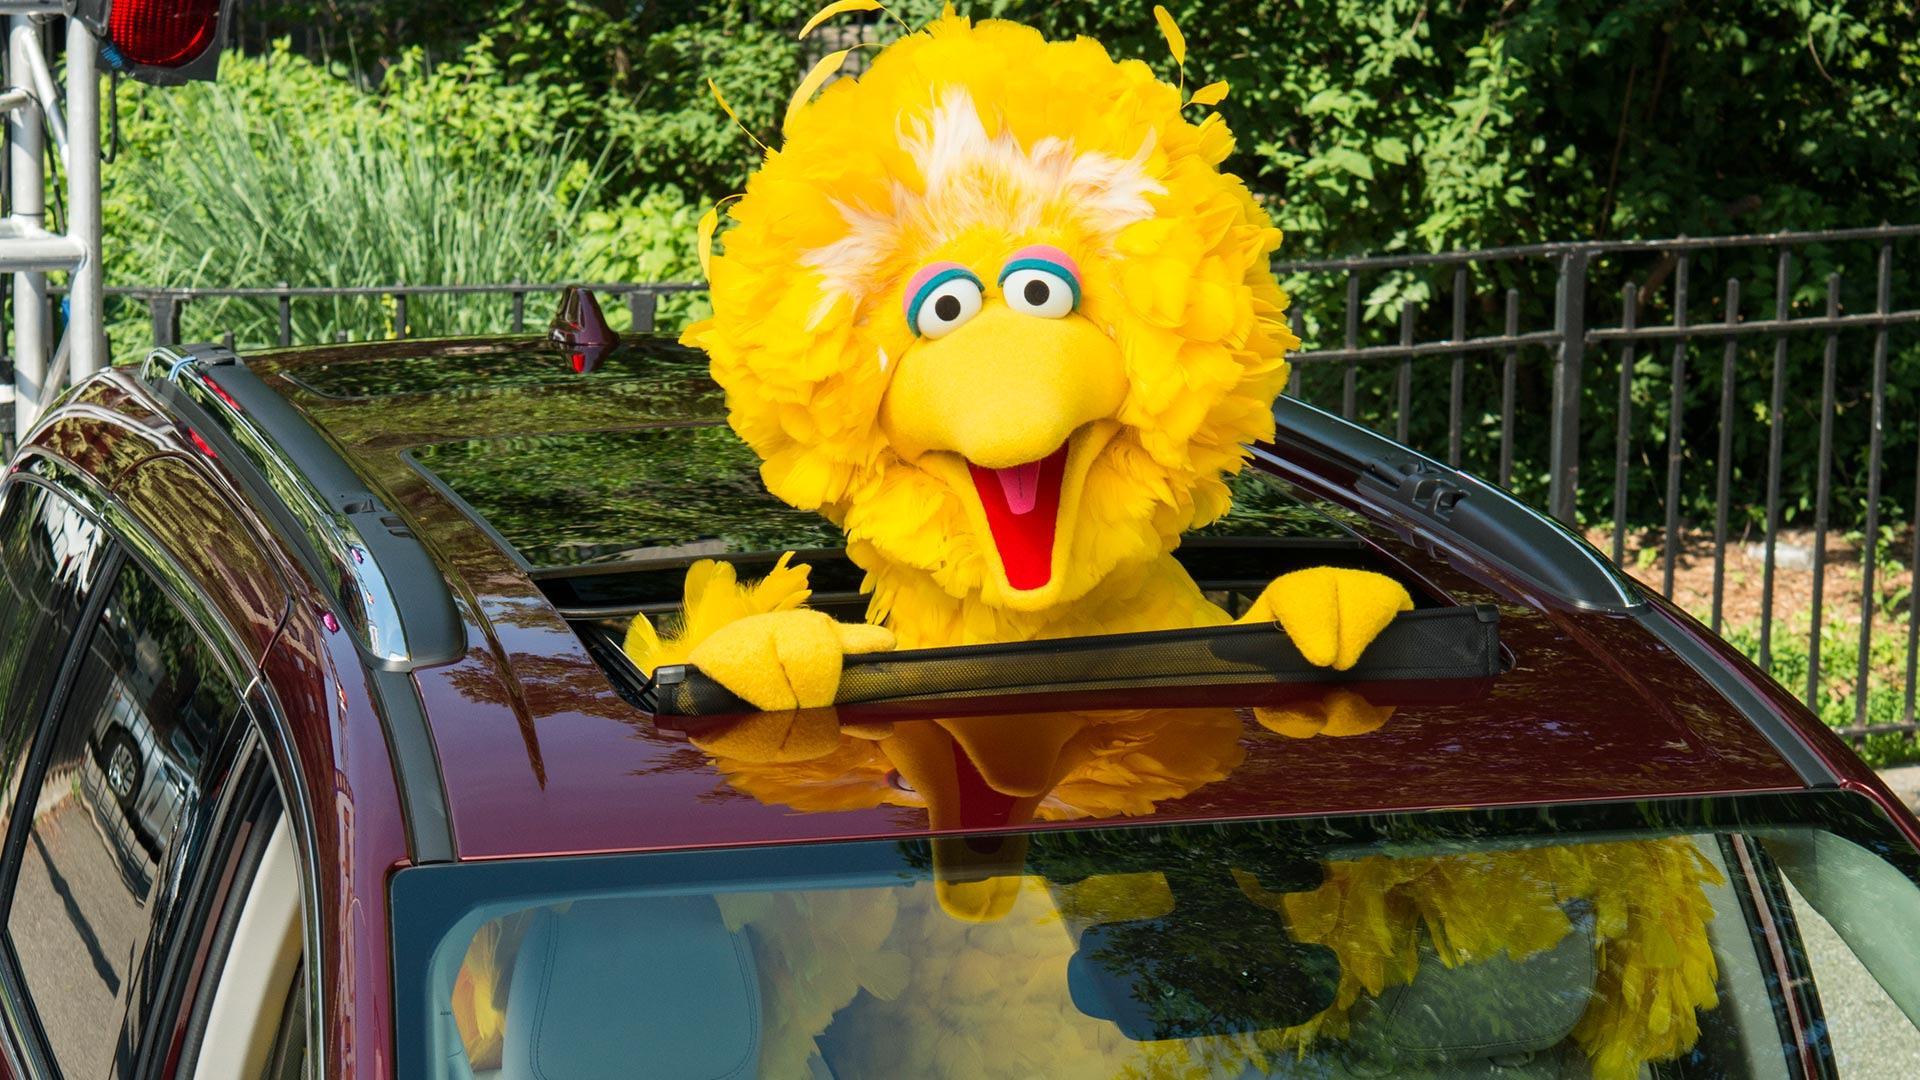 Chrysler | Muppet Wiki | FANDOM powered by Wikia